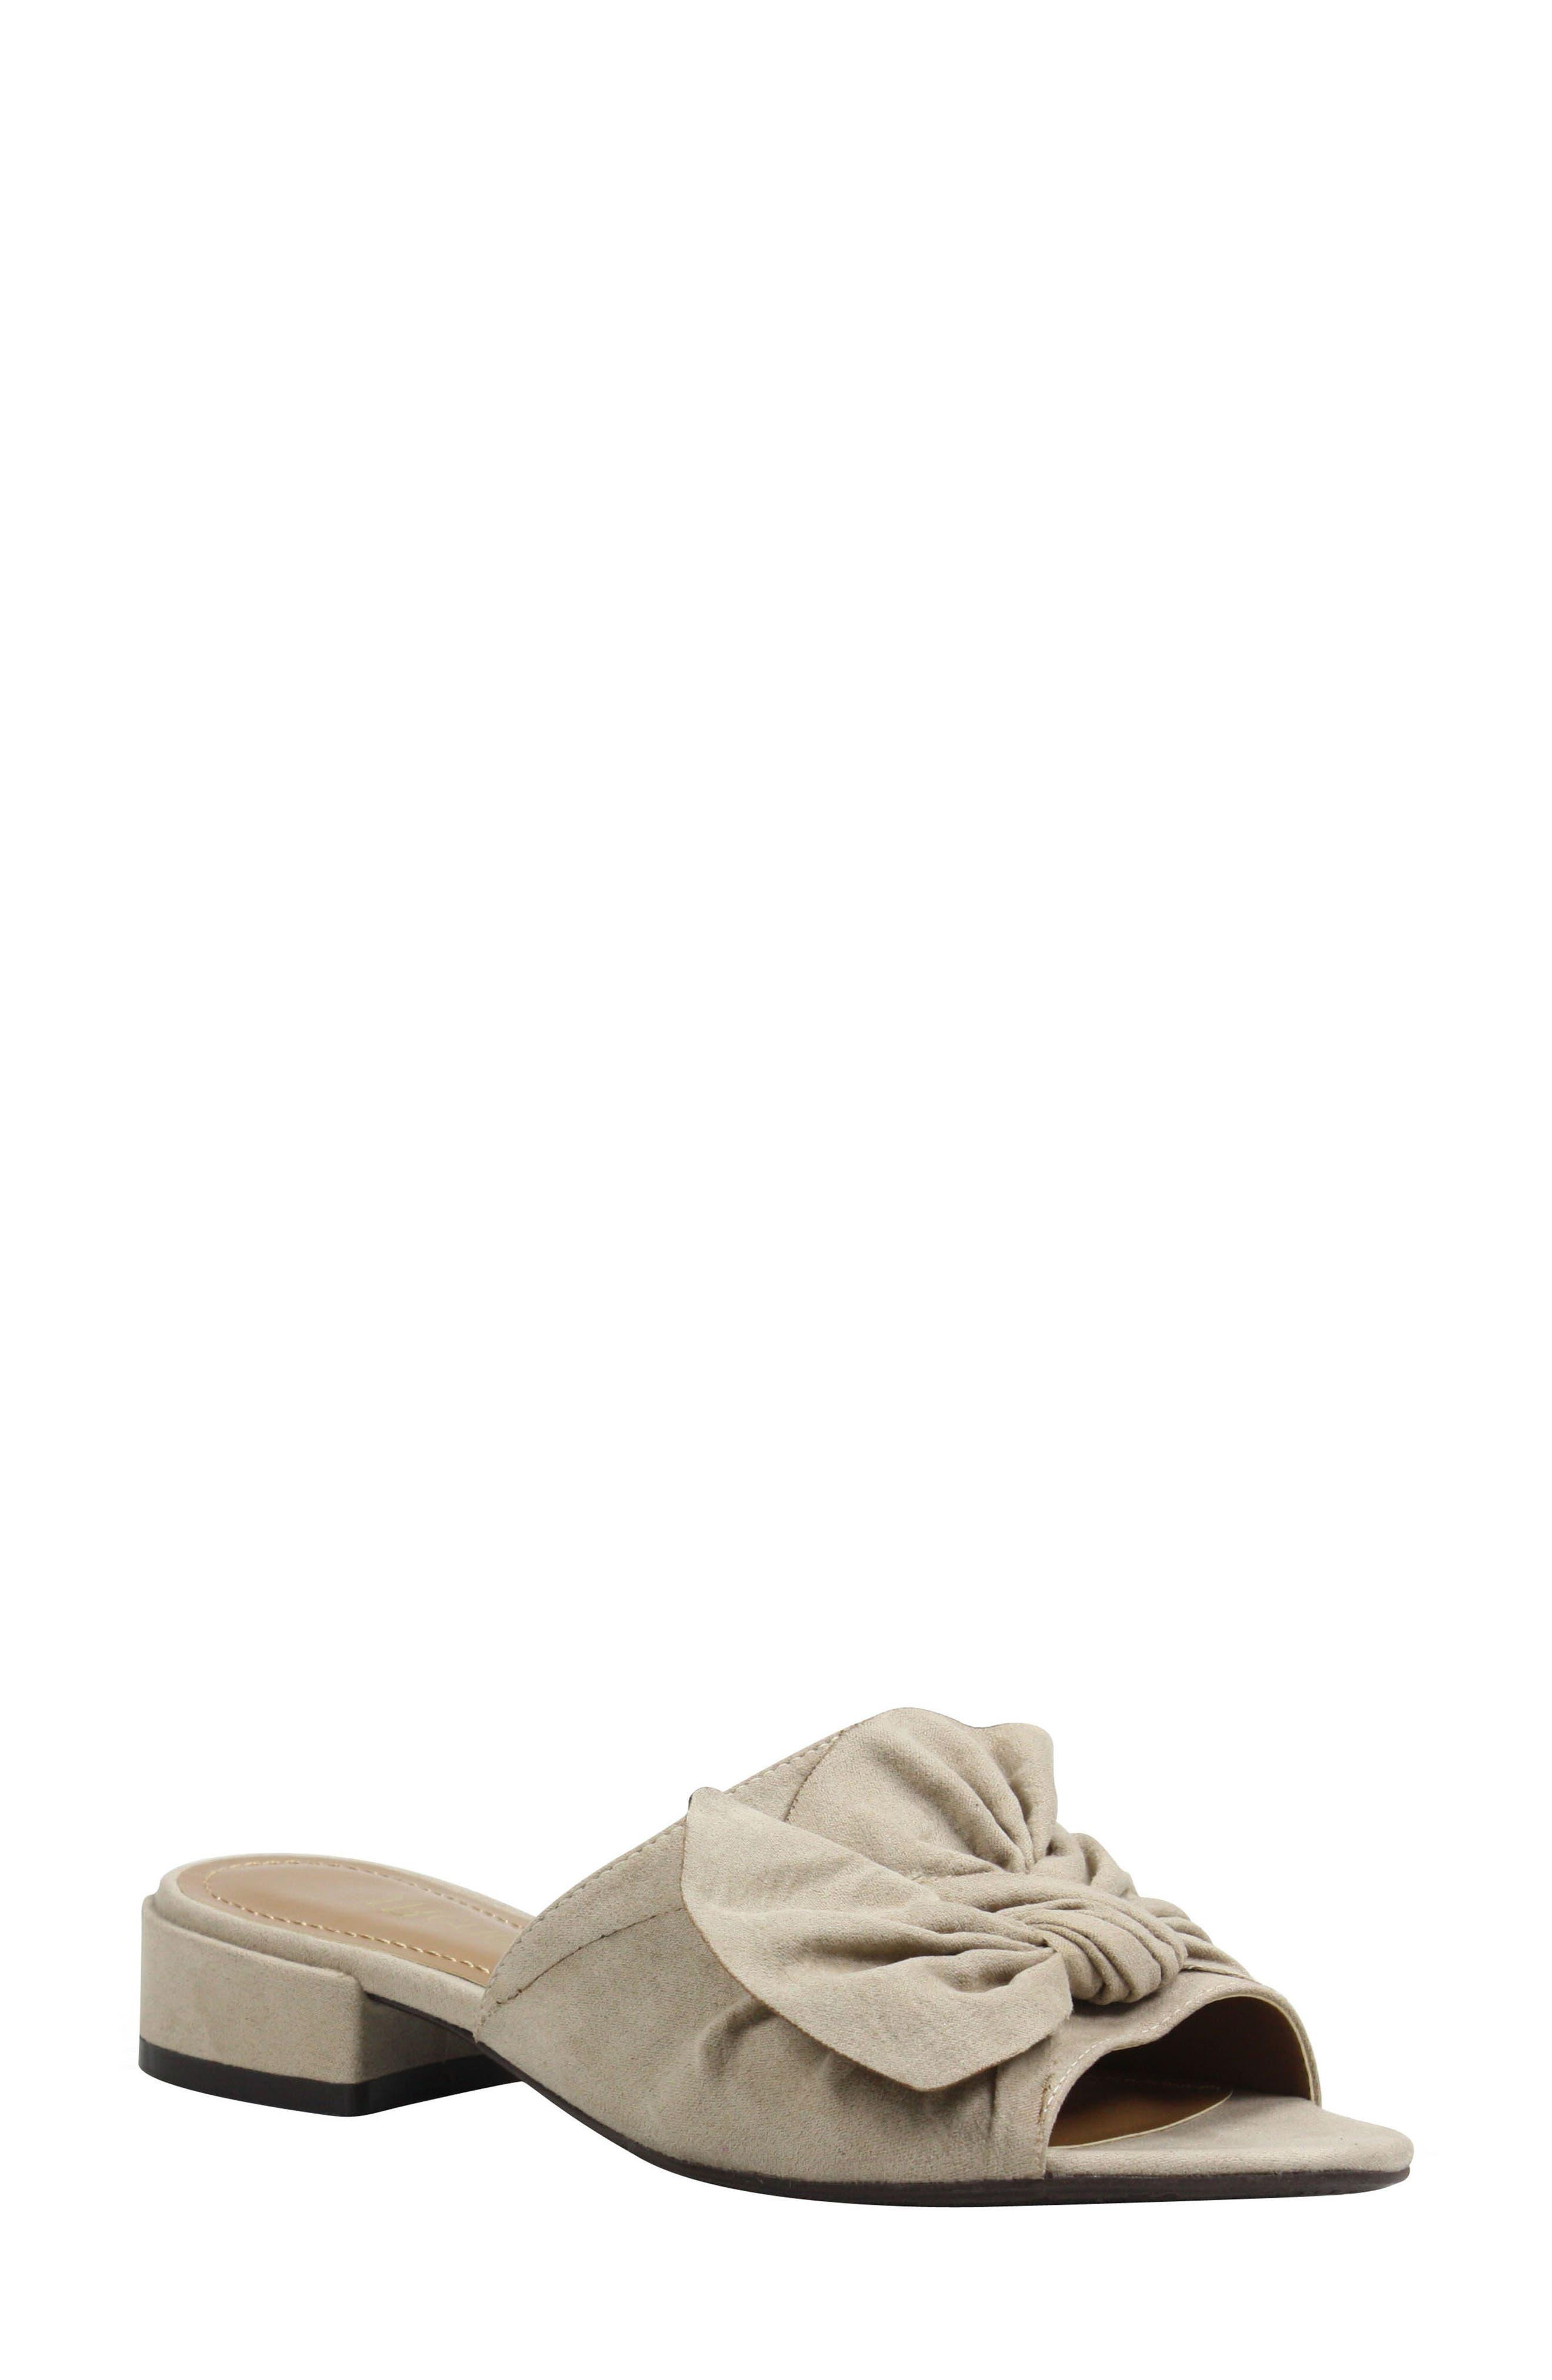 Sattuck Slide Sandal,                         Main,                         color, Dark Beige Fabric